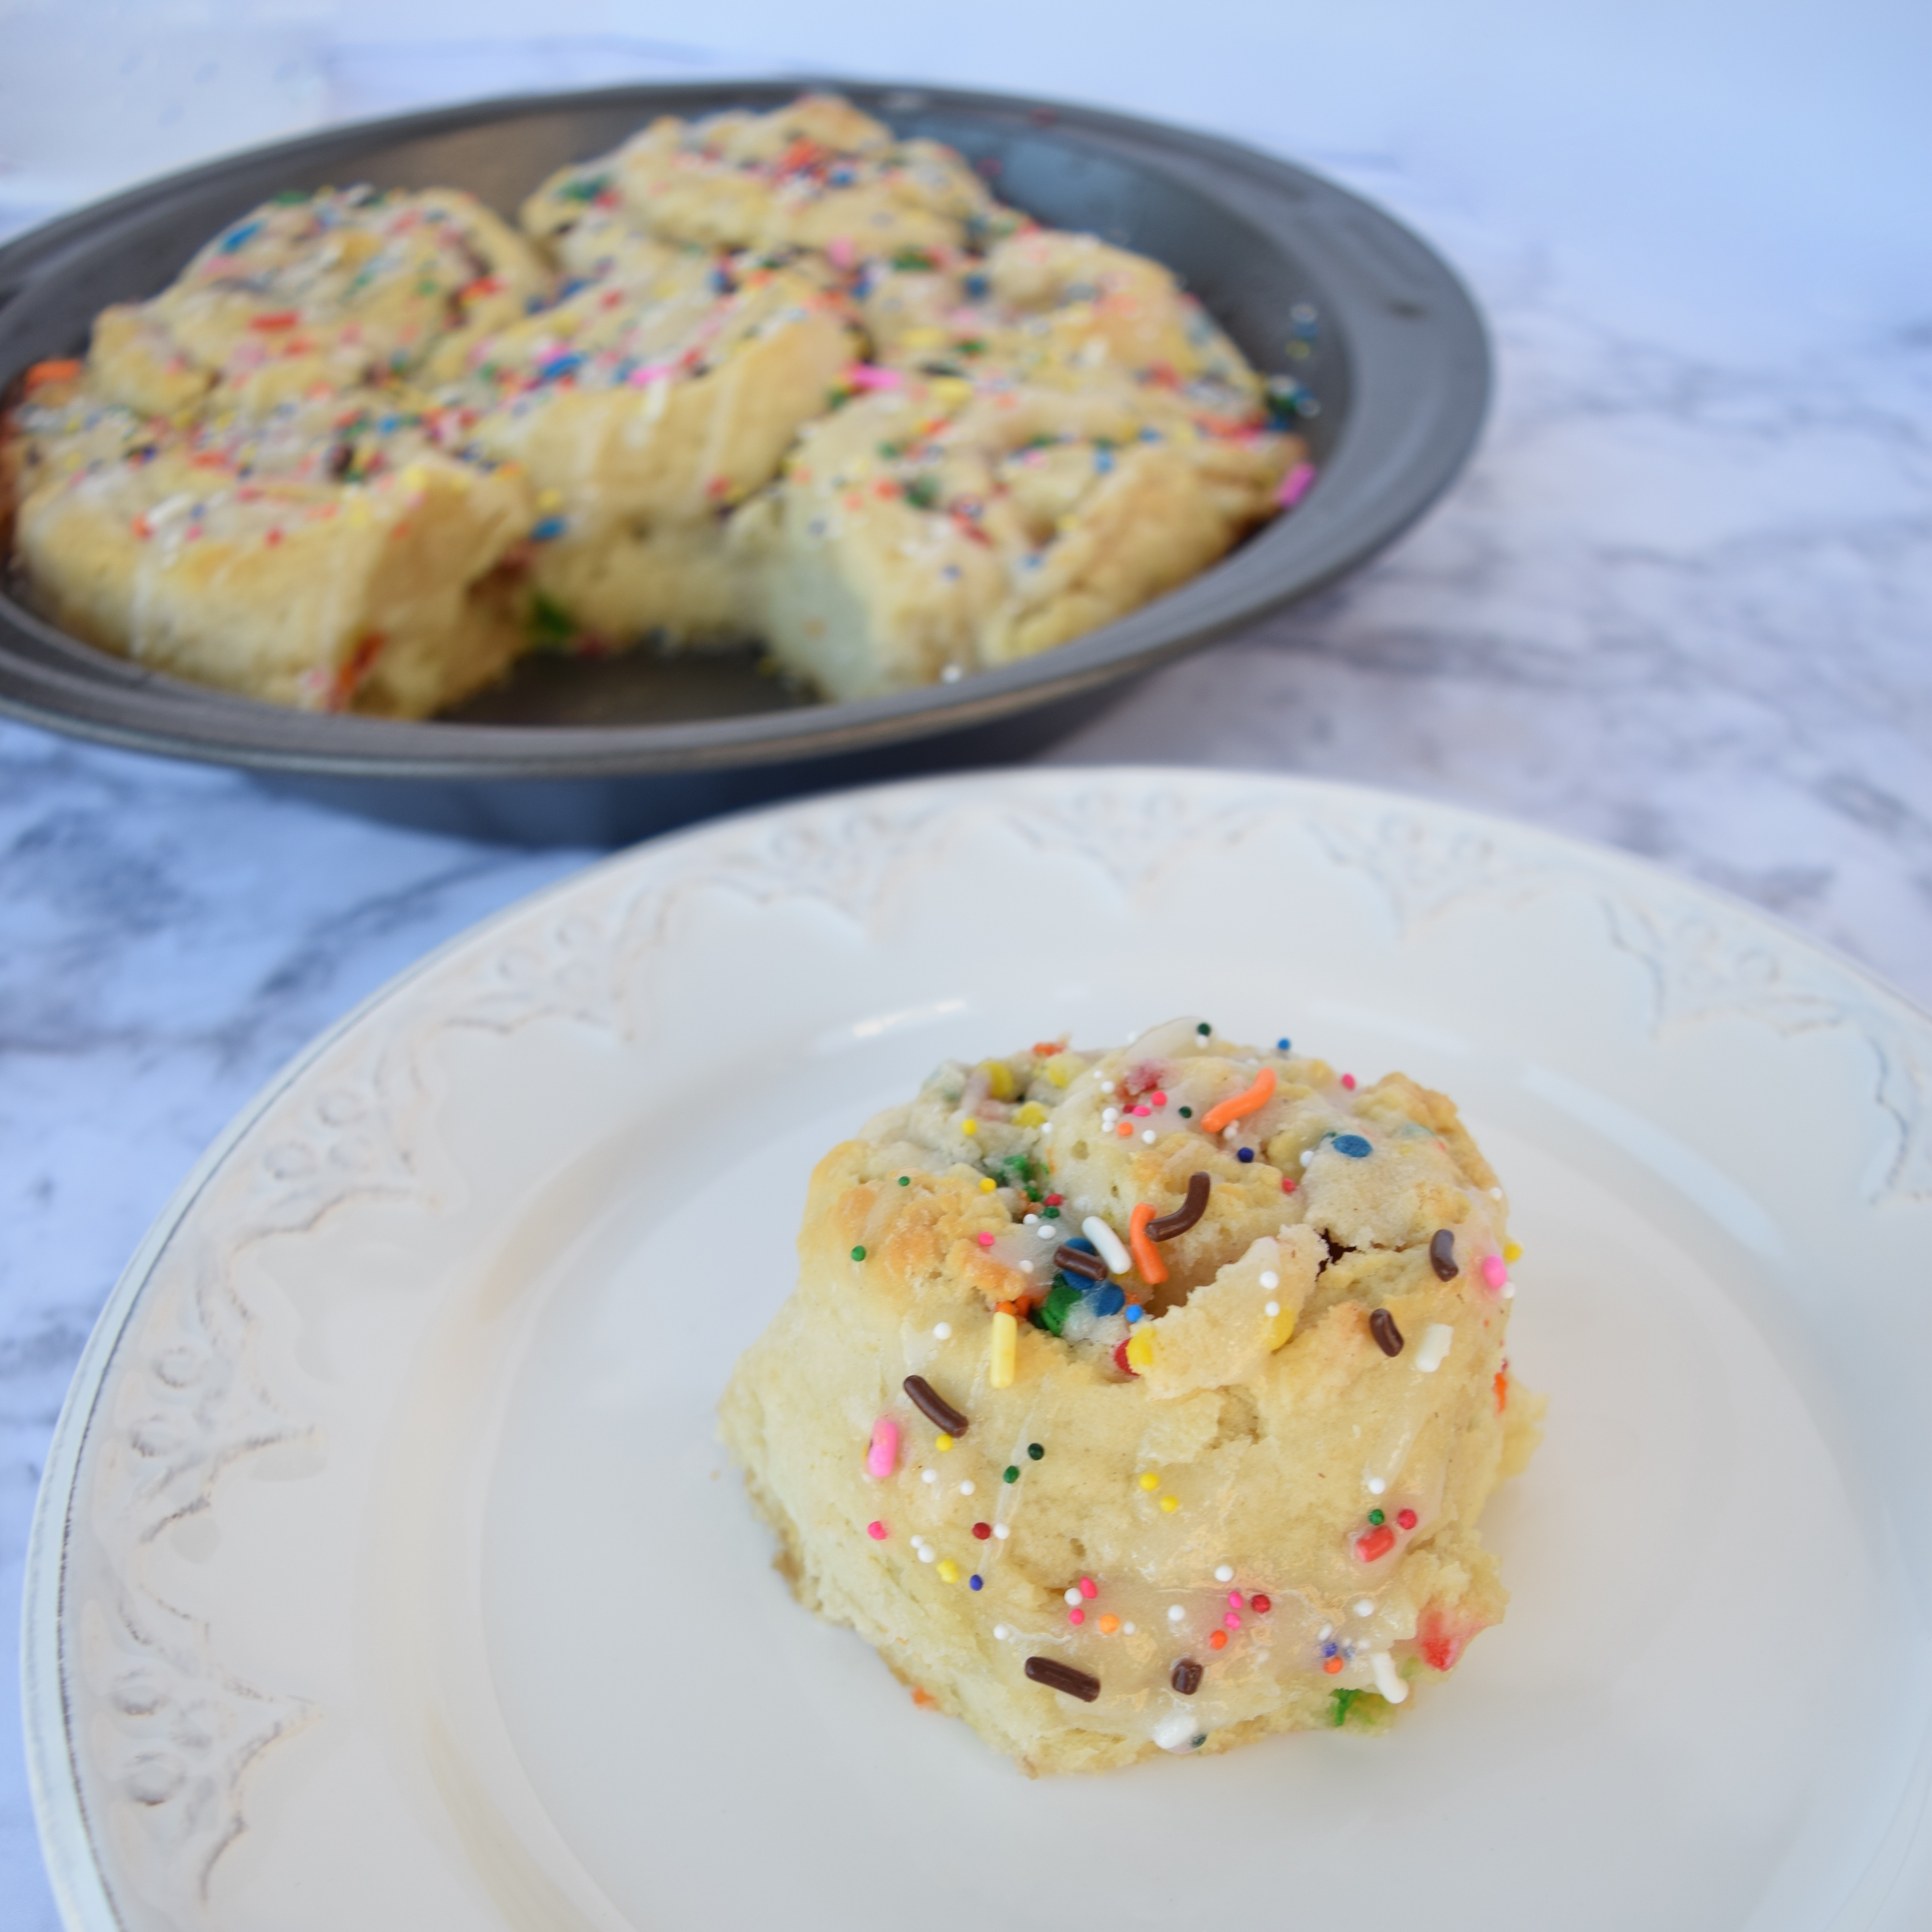 cake-batter-cinnamon-roll-recipe-